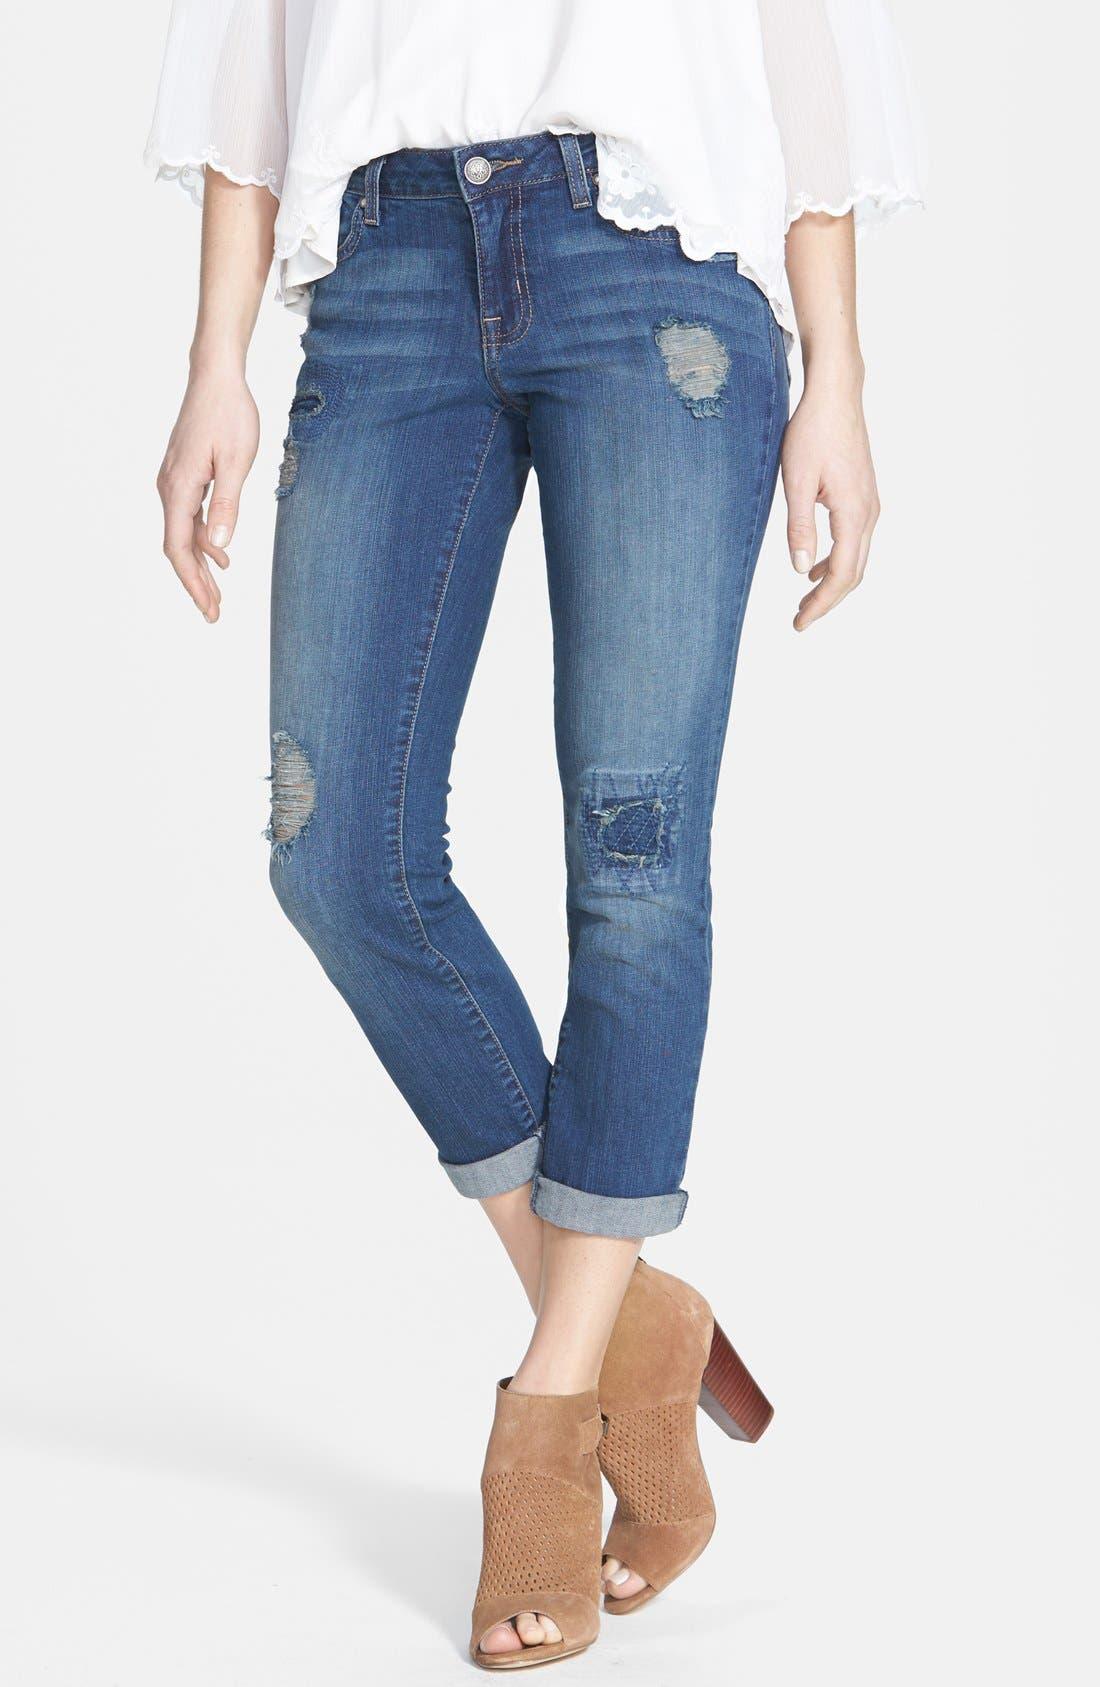 Main Image - Jessica Simpson 'Forever' Distressed Crop Skinny Jeans (Bluesine/Spain)